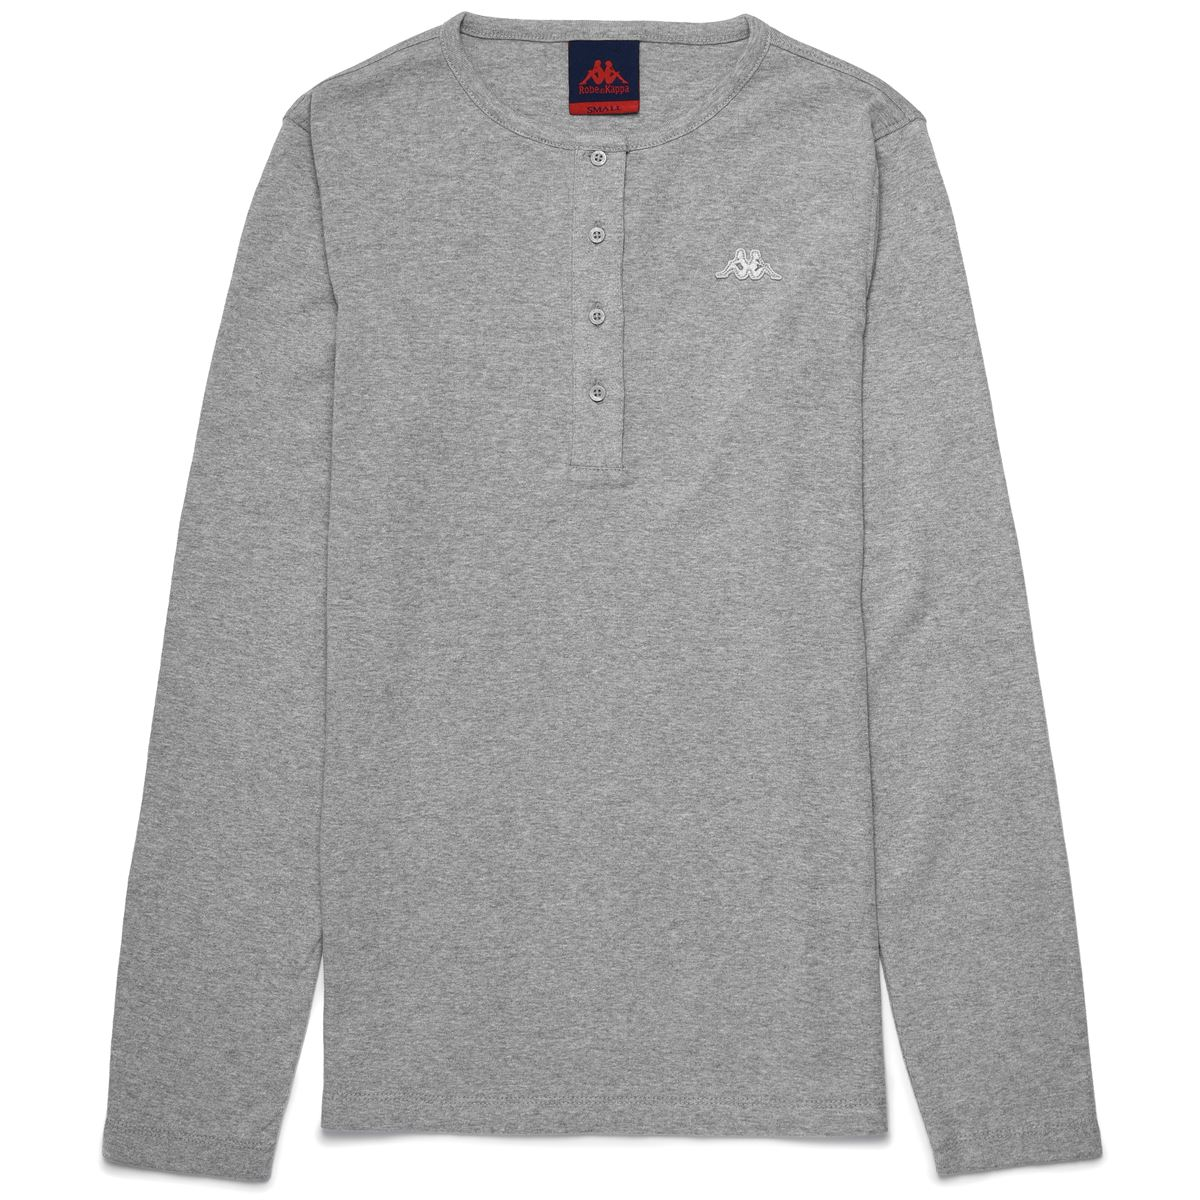 Robe di Kappa T-shirts & Top donna-661141W